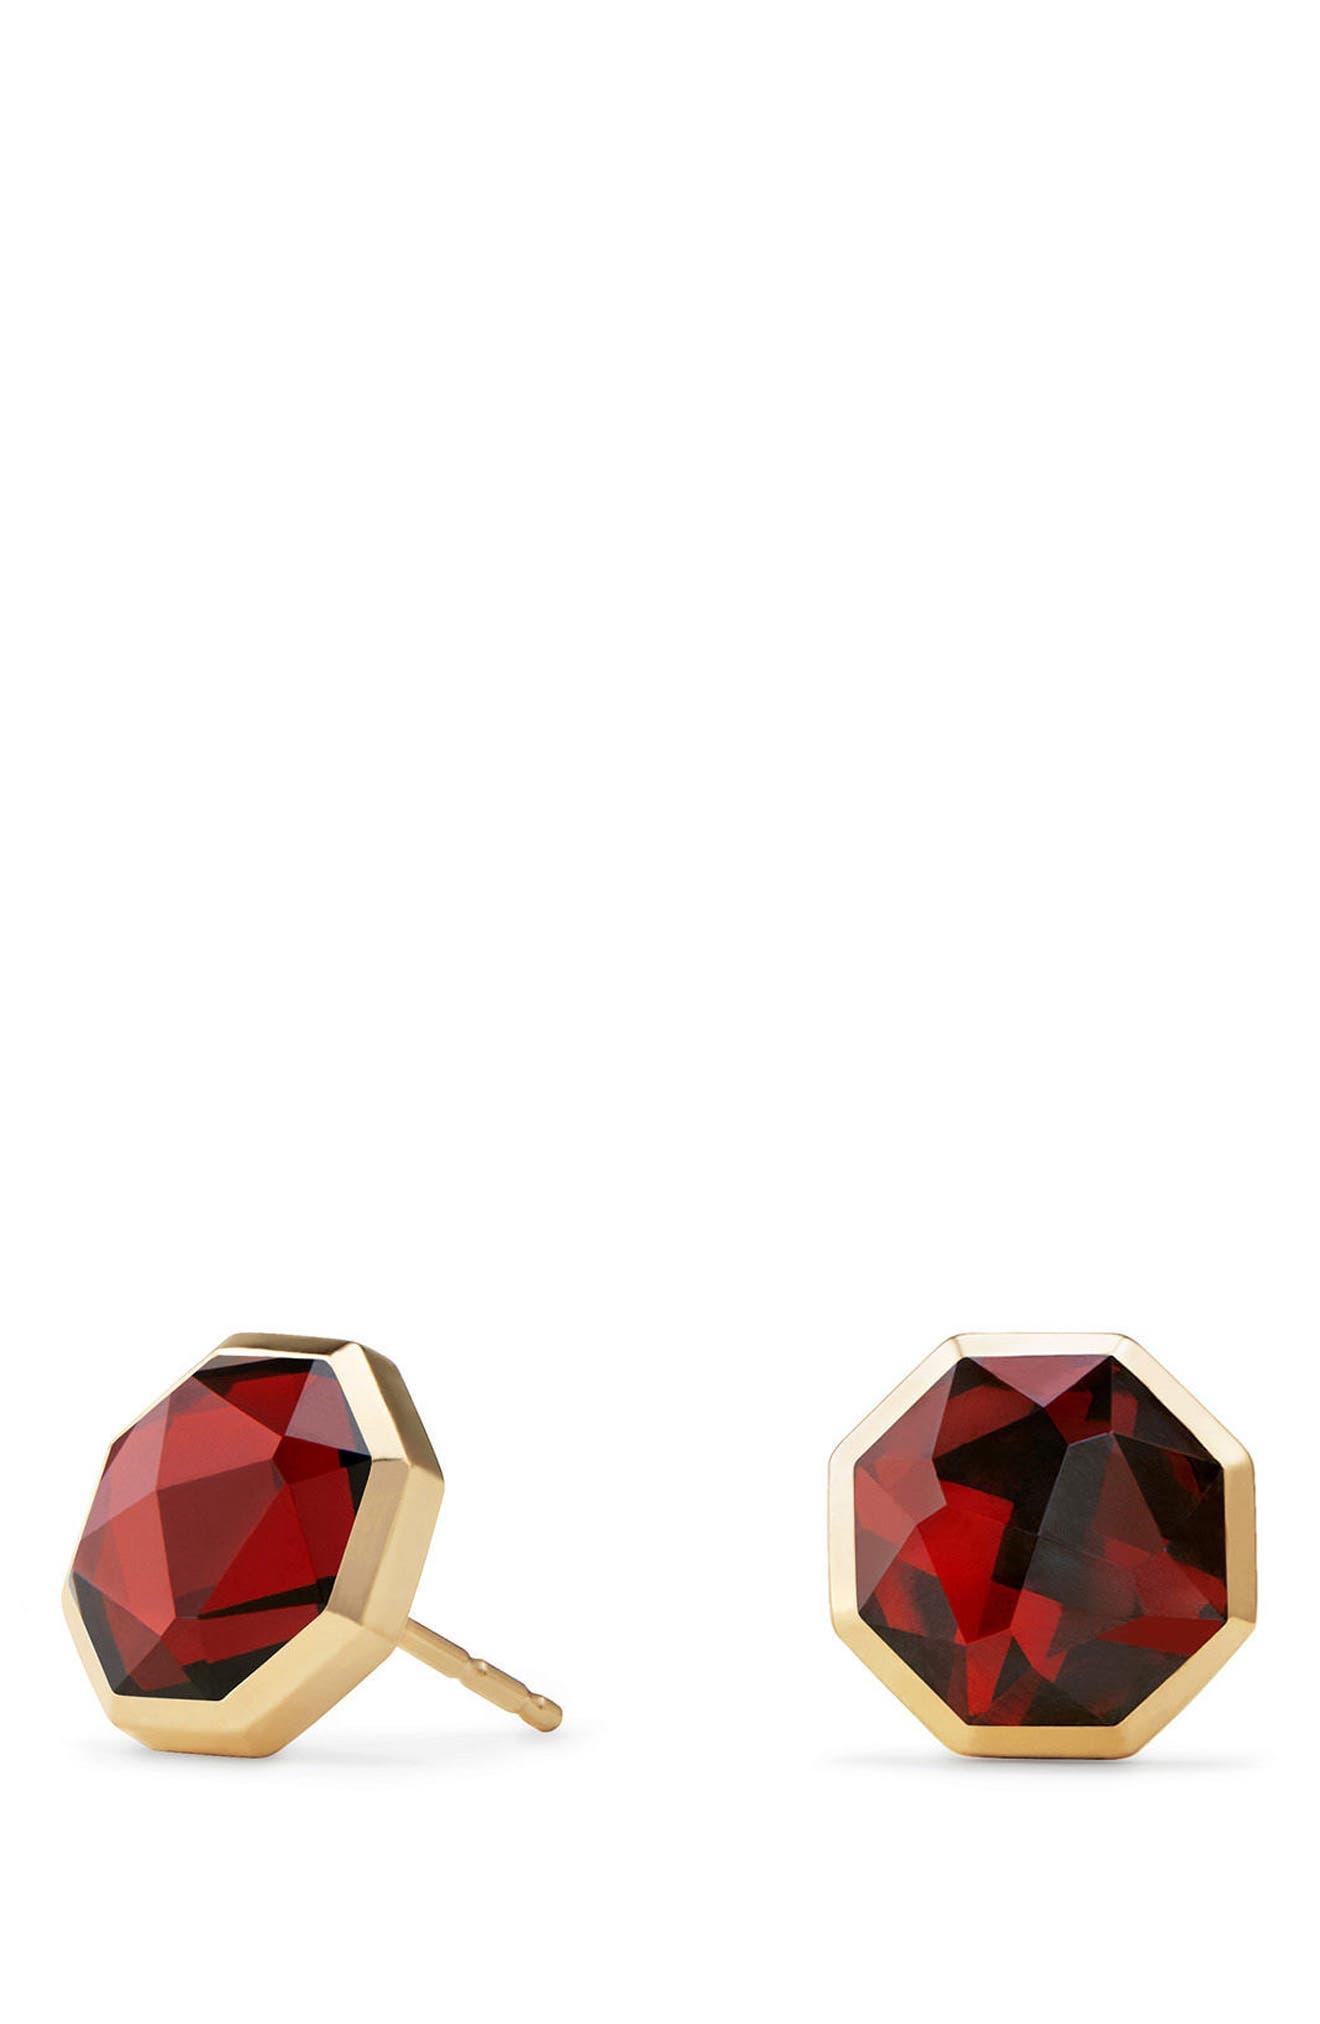 Main Image - David Yurman Guilin Octagon Earrings in 18K Gold